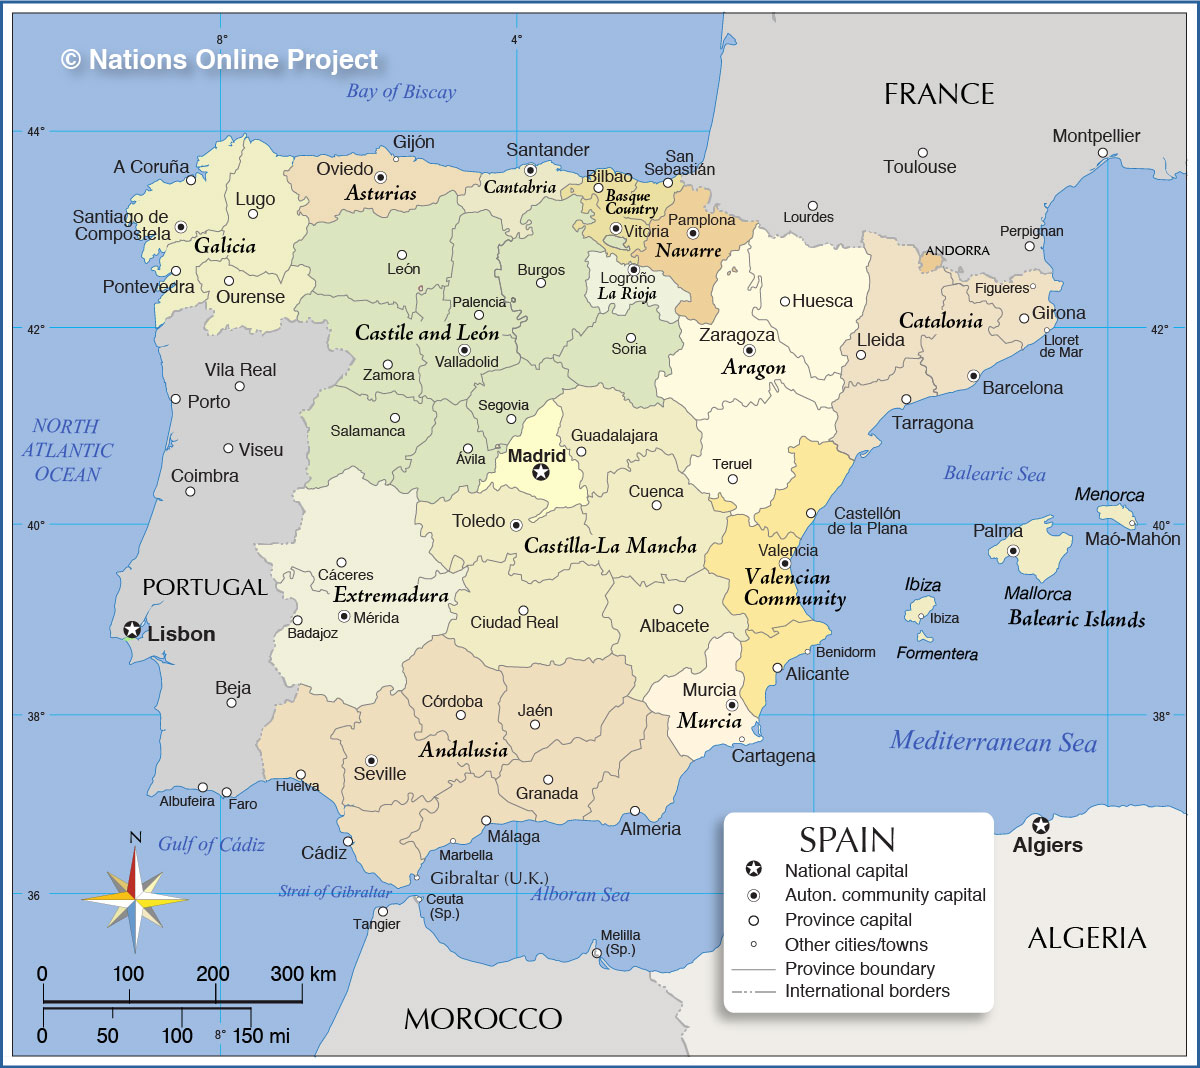 Map of Spanish Regions